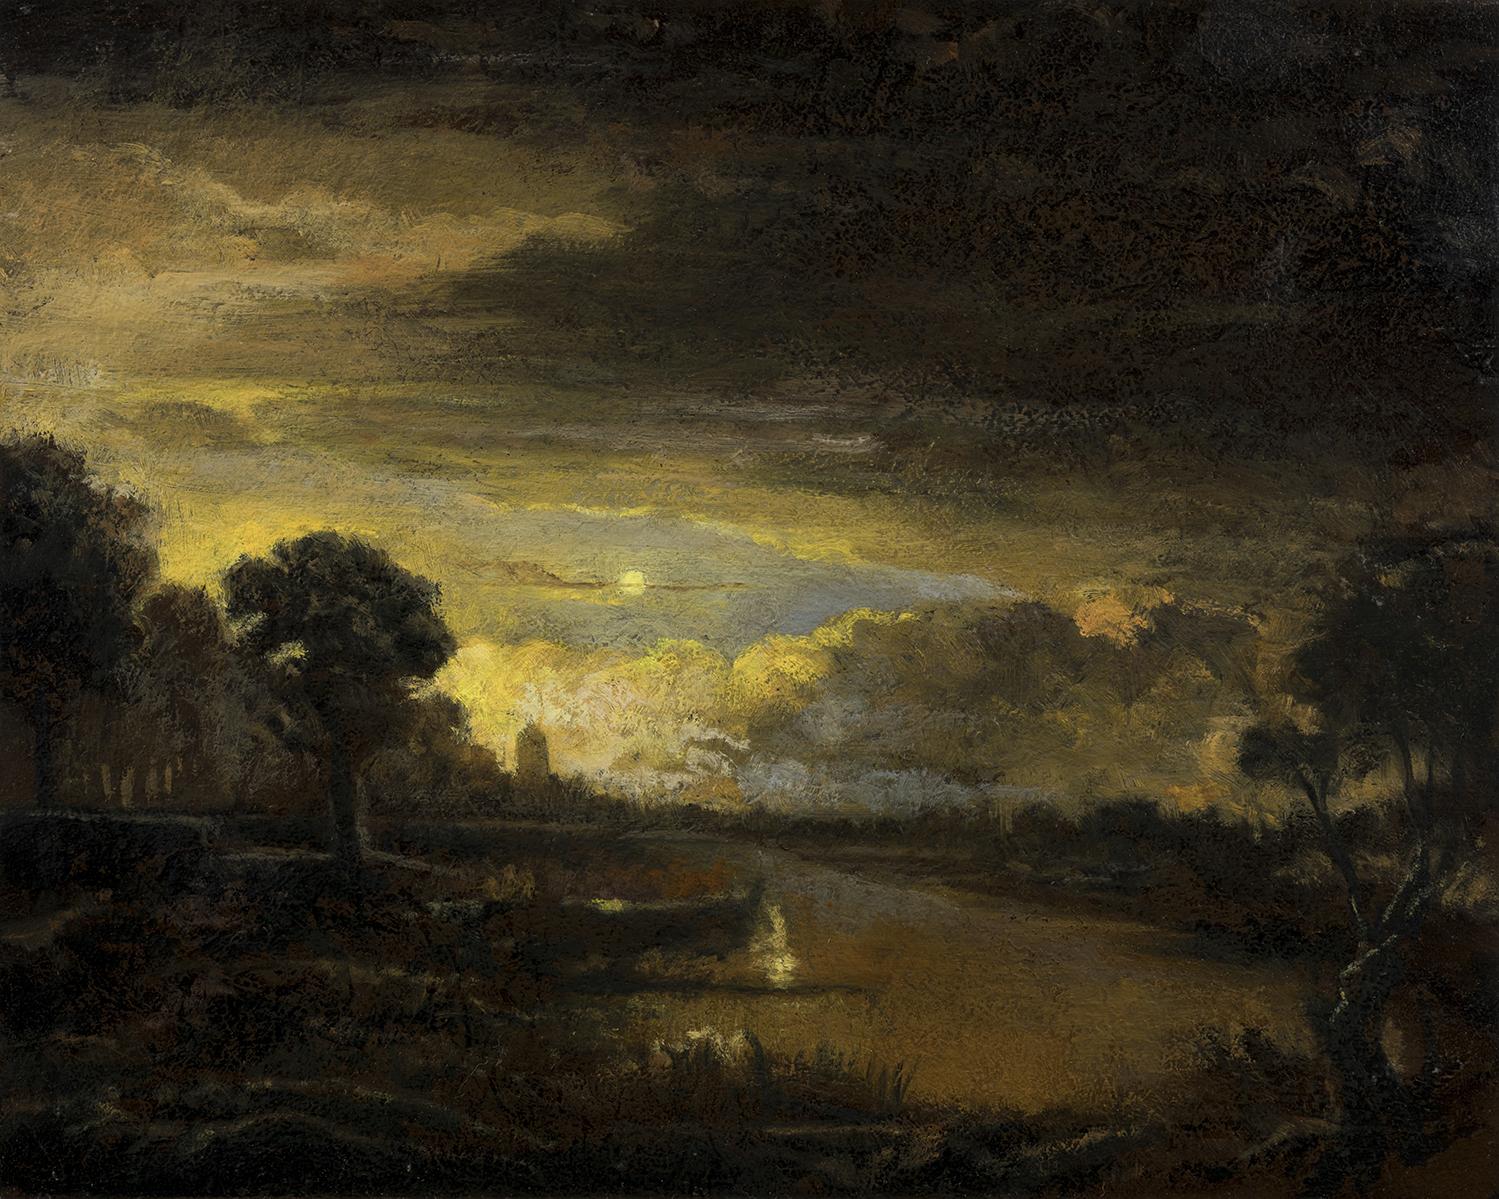 Study after:Aert Van Der Neer River Scene by M Francis McCarthy - 8x10 Oil on Wood Panel